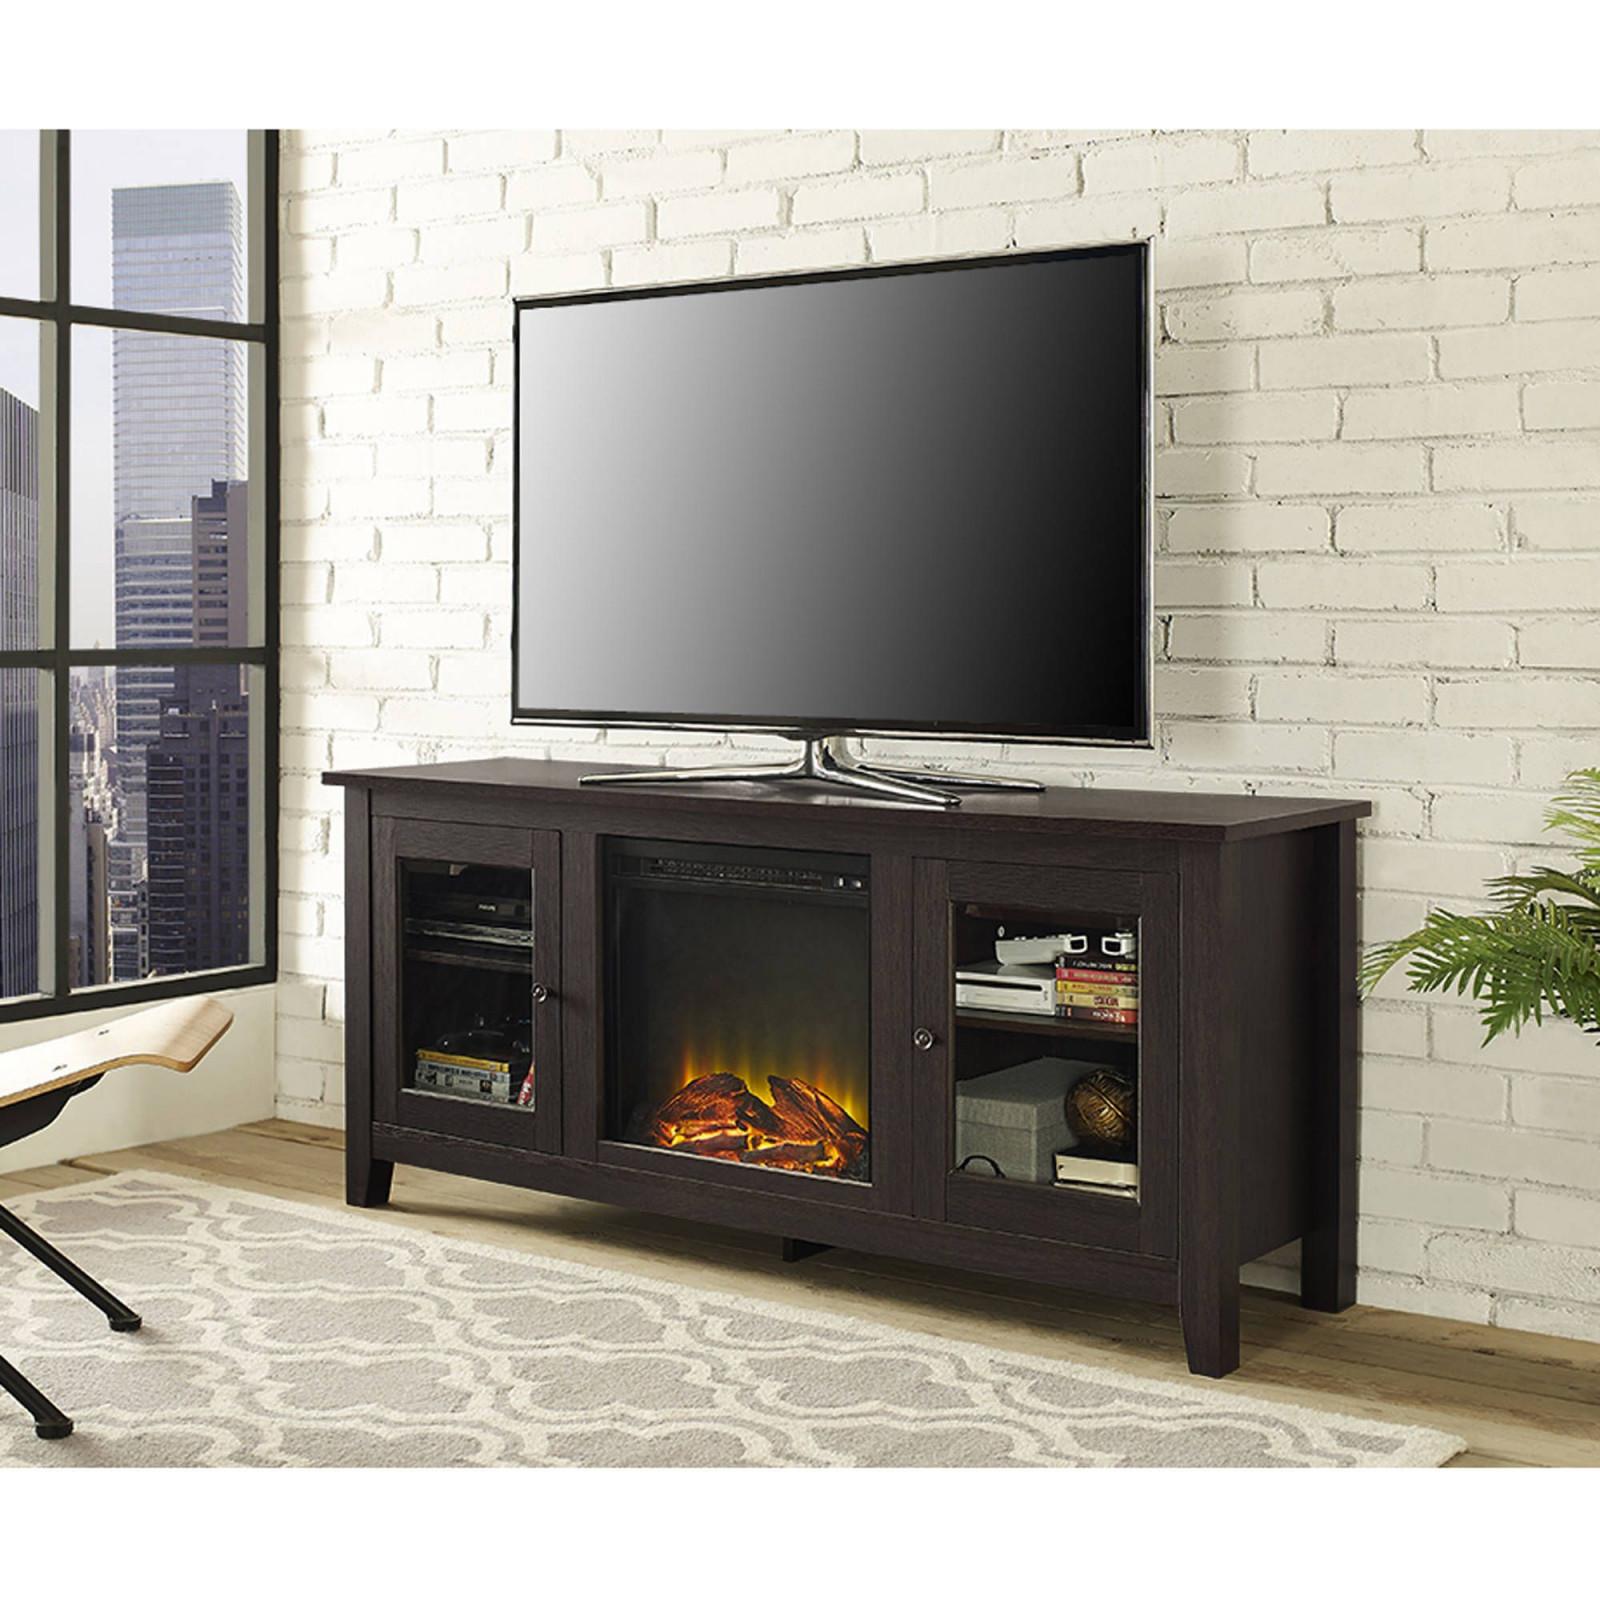 60 inch tv stand belle pretty corner fireplace tv stand for 60 inch tv and whalen barston of 60 inch tv stand